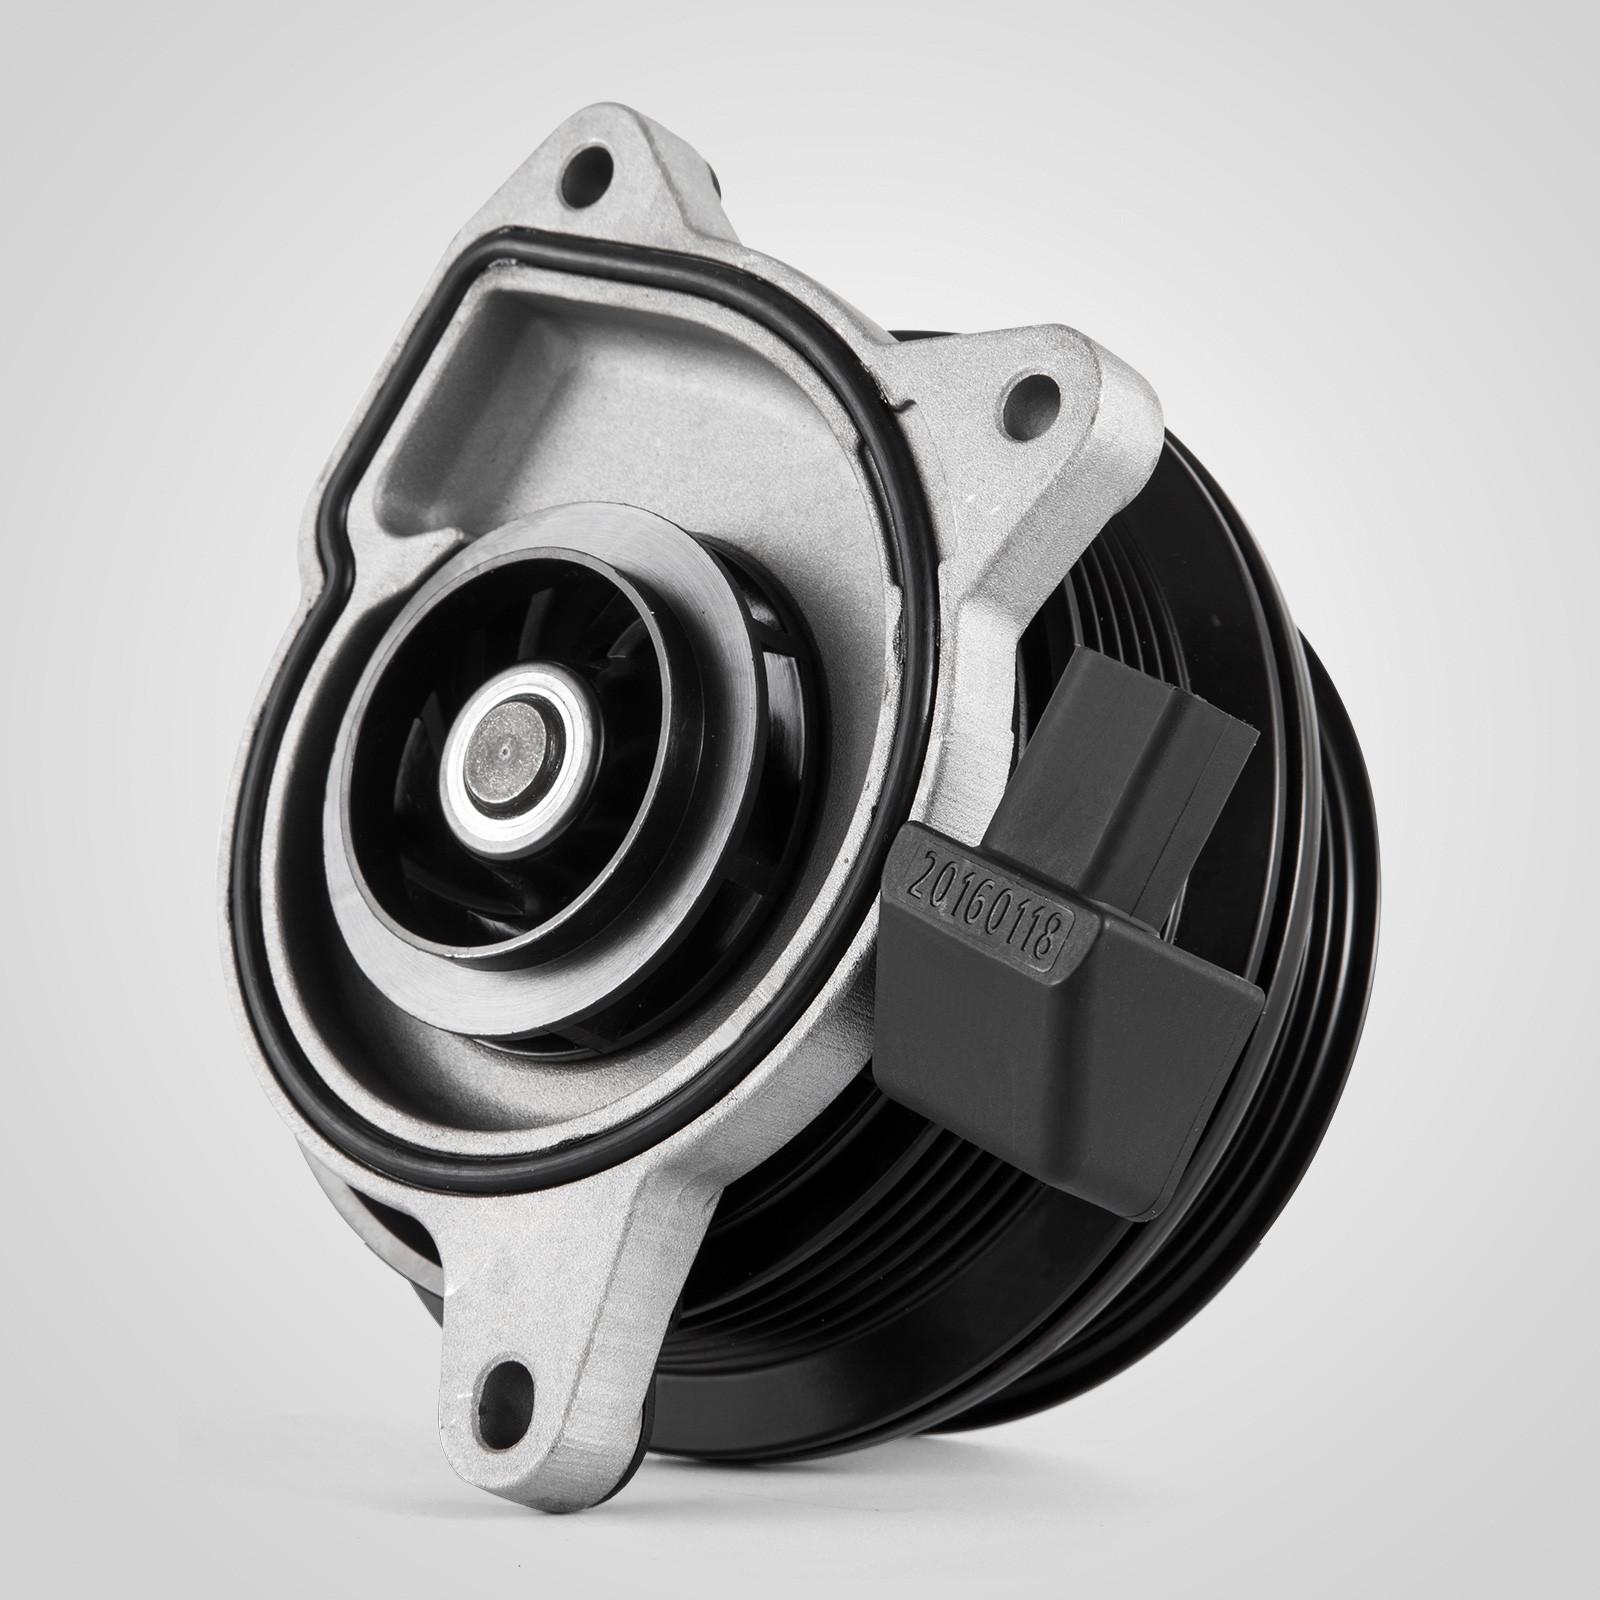 hight resolution of 8 new volkswagen audi skoda golf mk6 beetle water pump